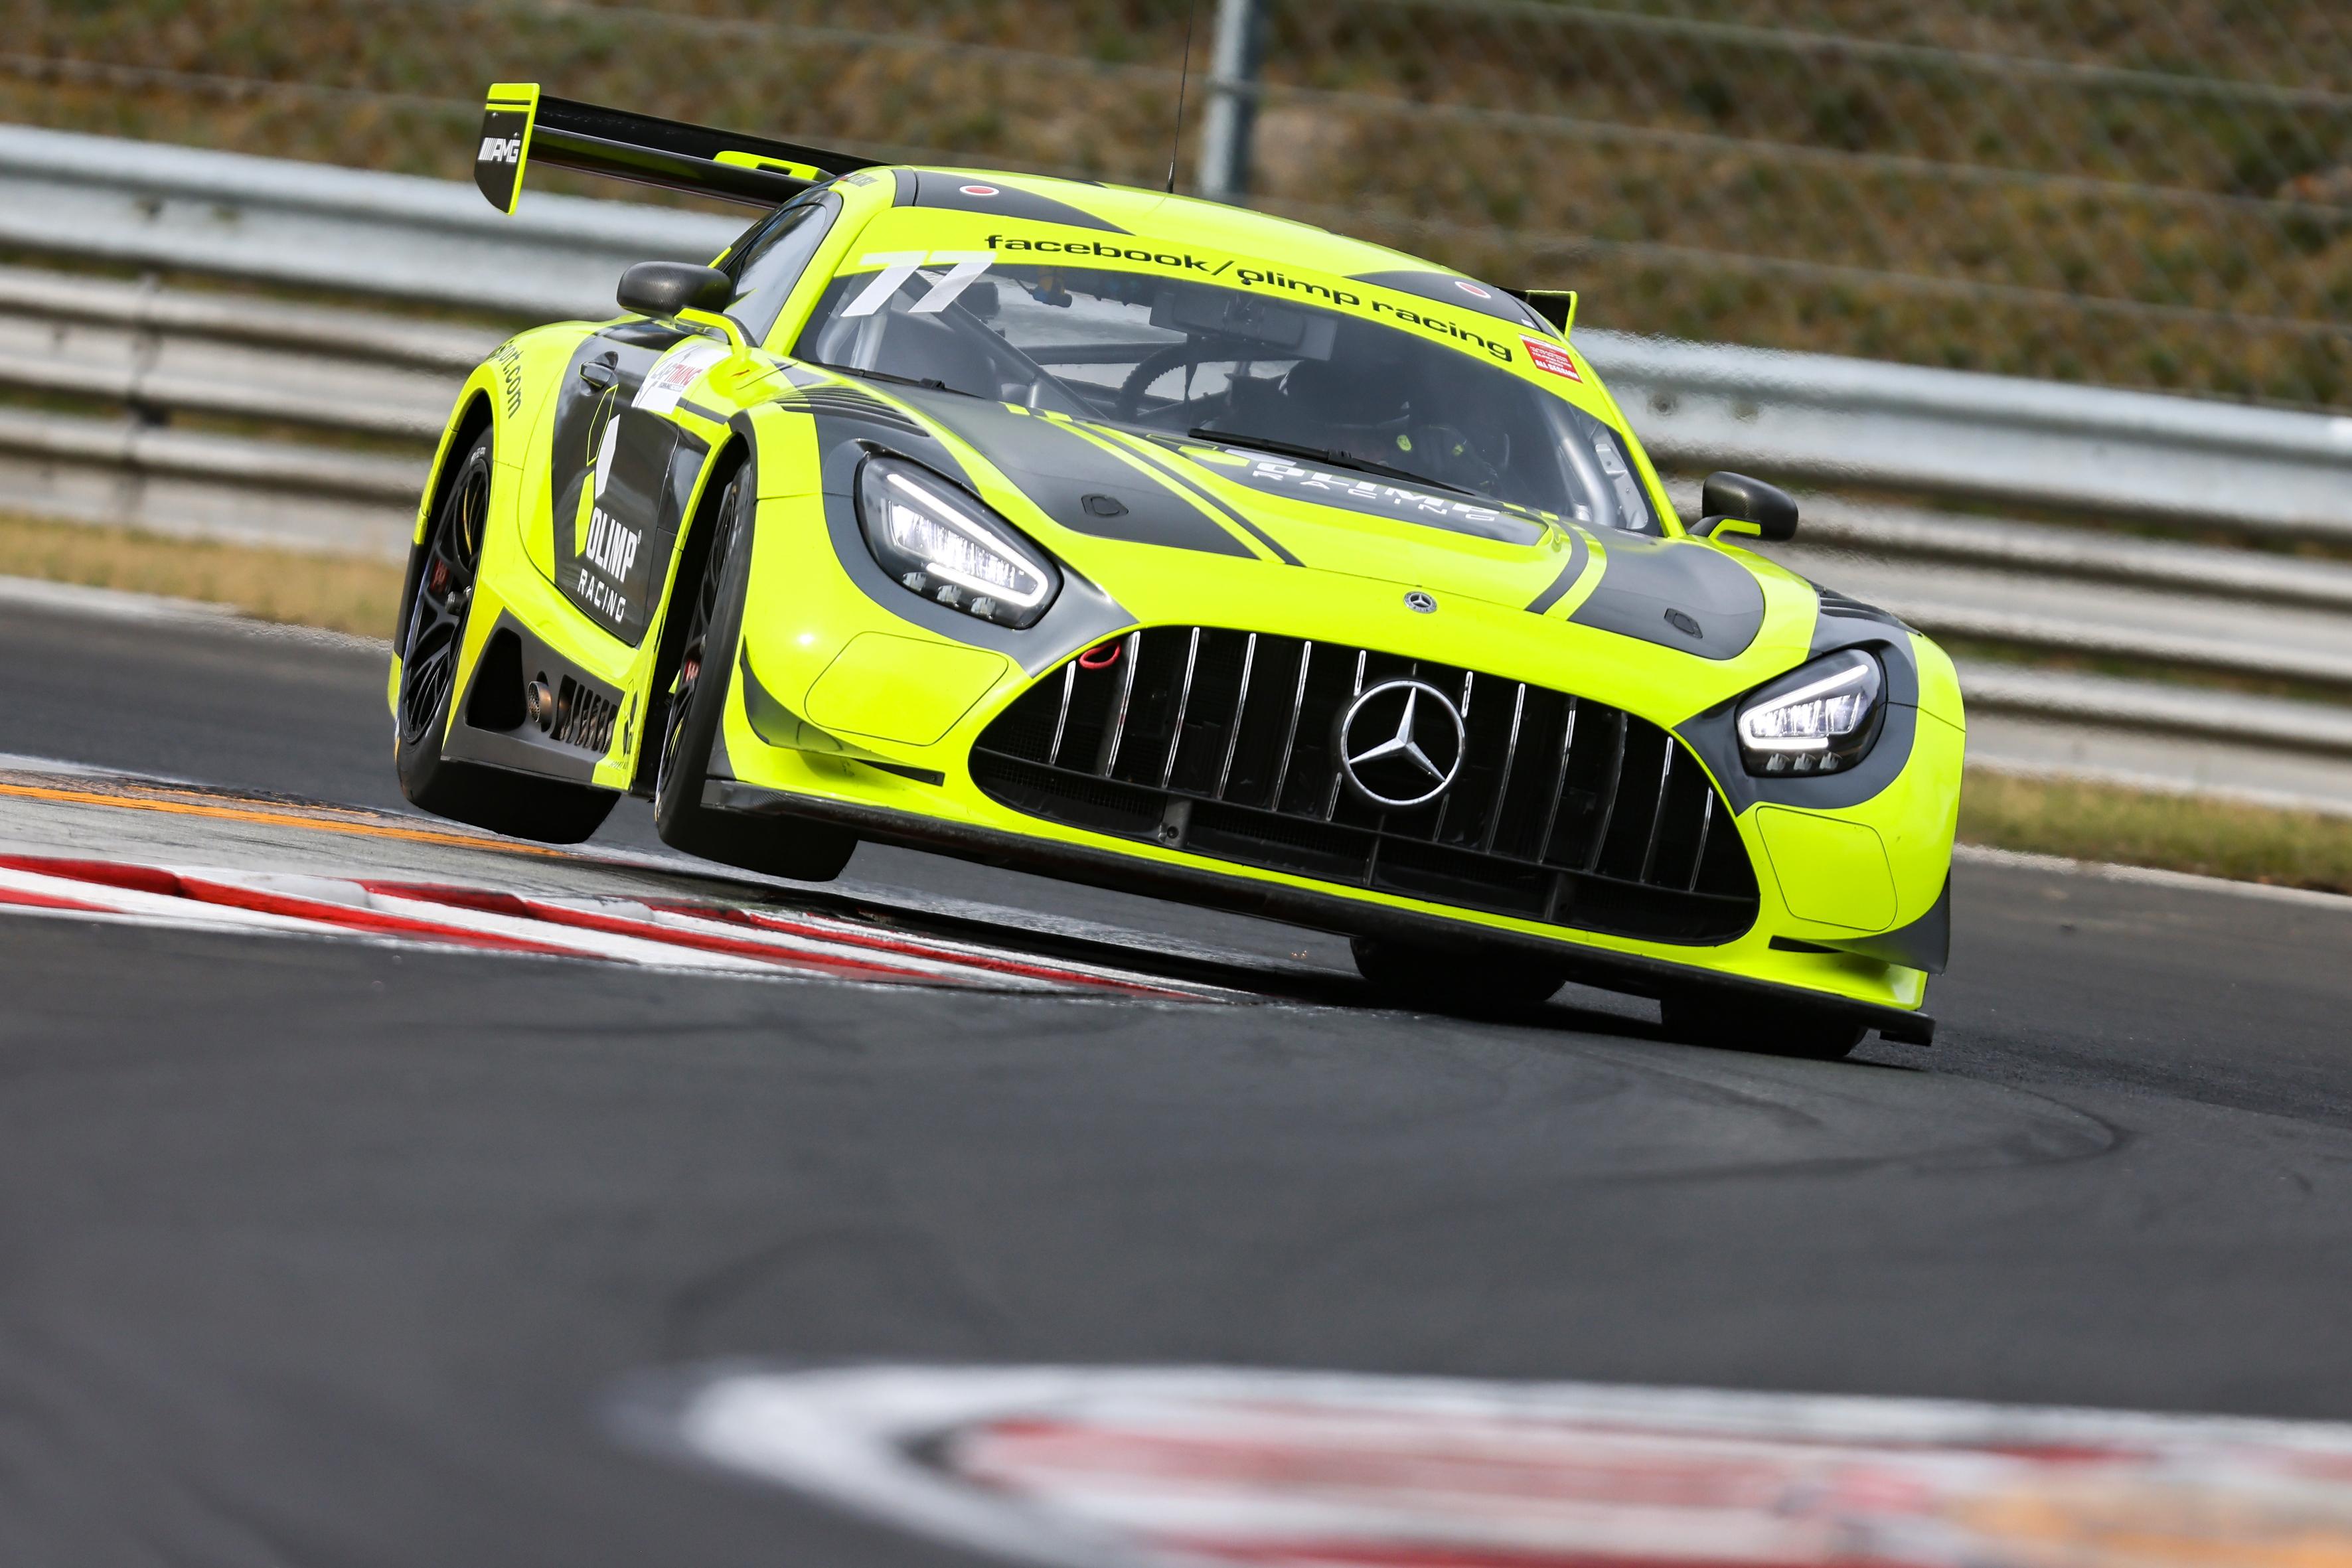 Jedlinski already became GT sprint champion